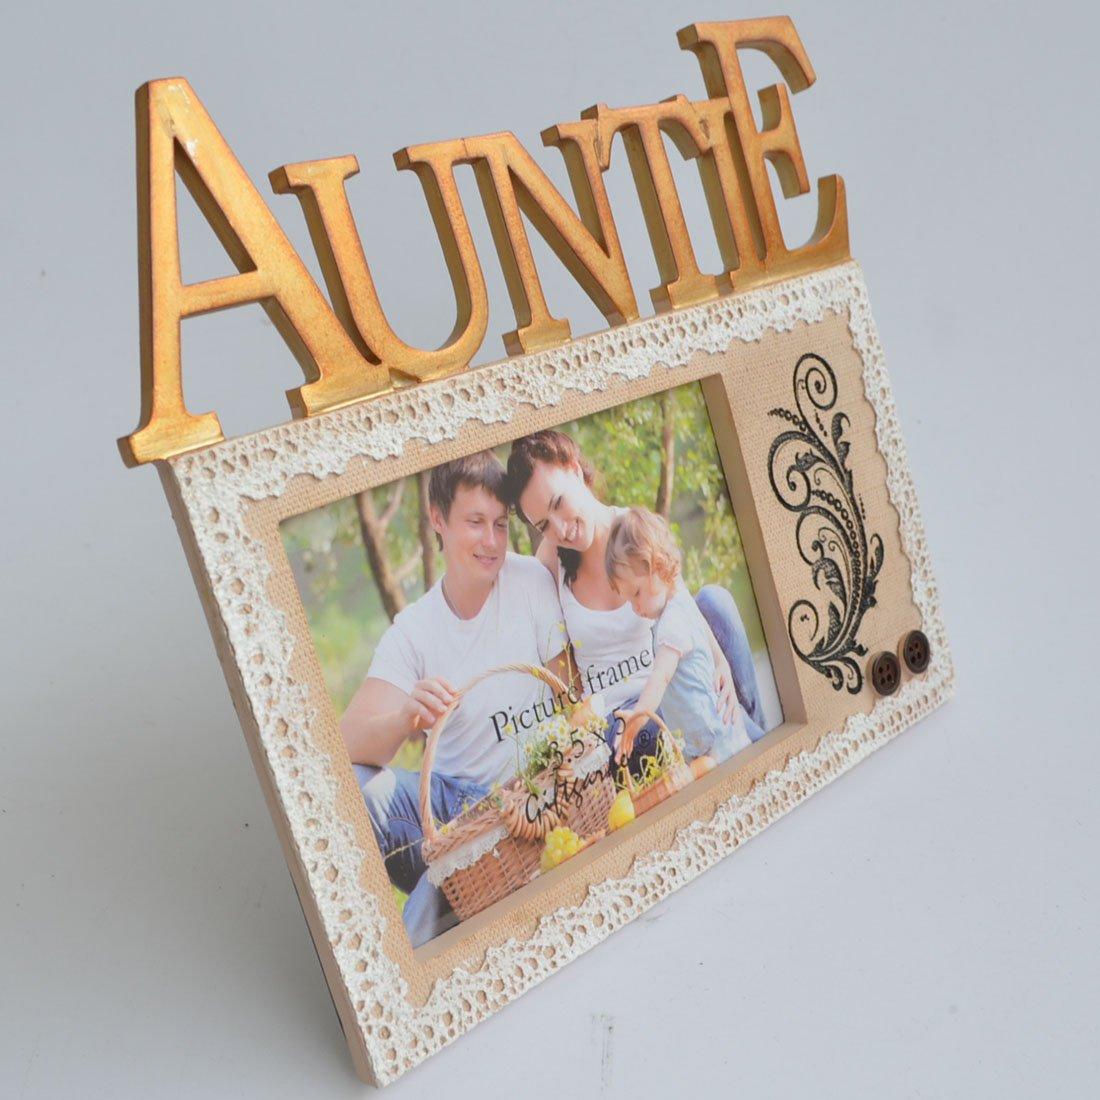 Amazon.de: Giftgarden 9x13 Kunstharz Bilderrahmen mit Auntie ...